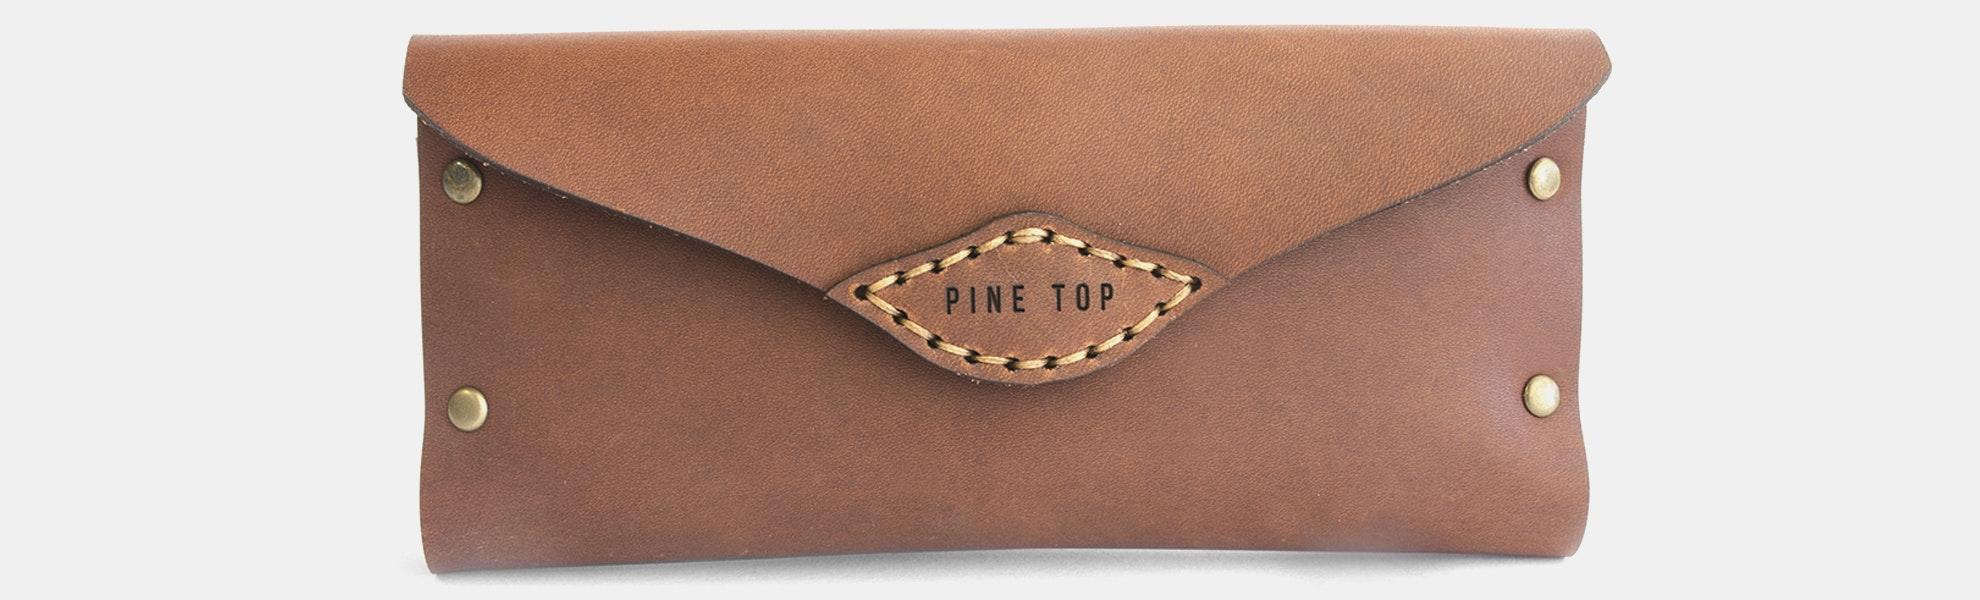 Pine Top Glasses Case